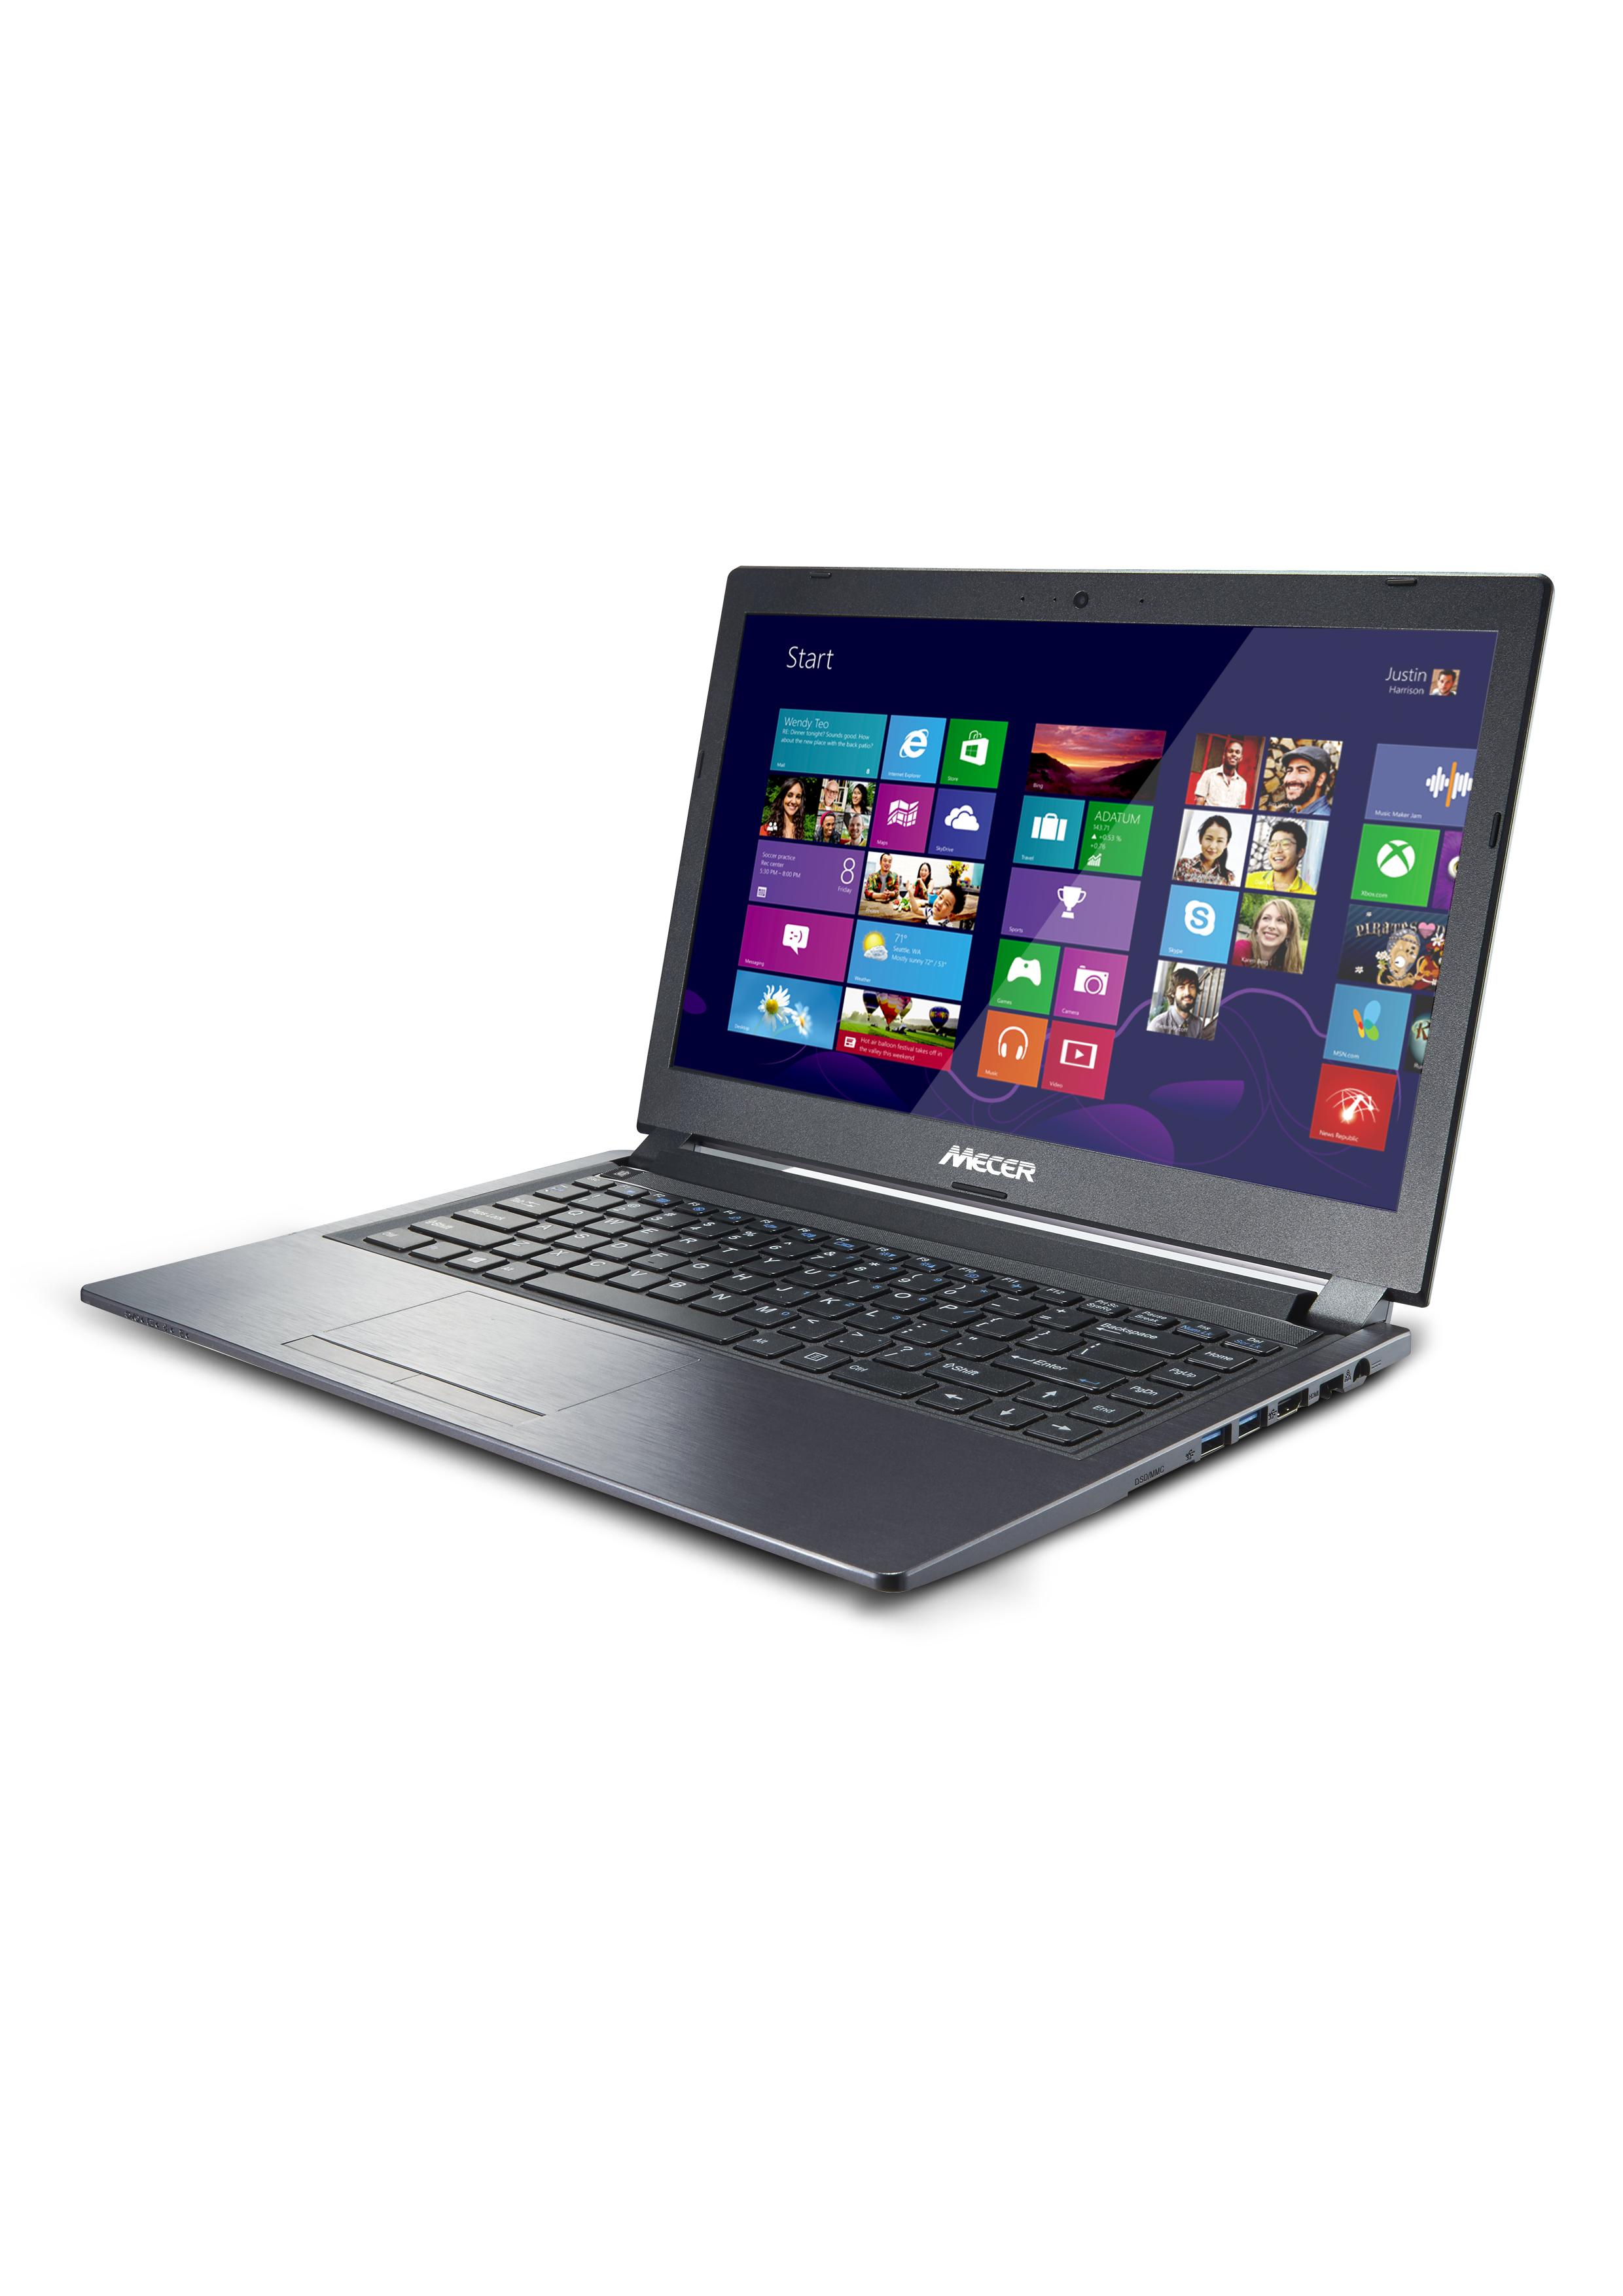 Mecer Xpression W840AU-I7-5500 14″ Ultrabook